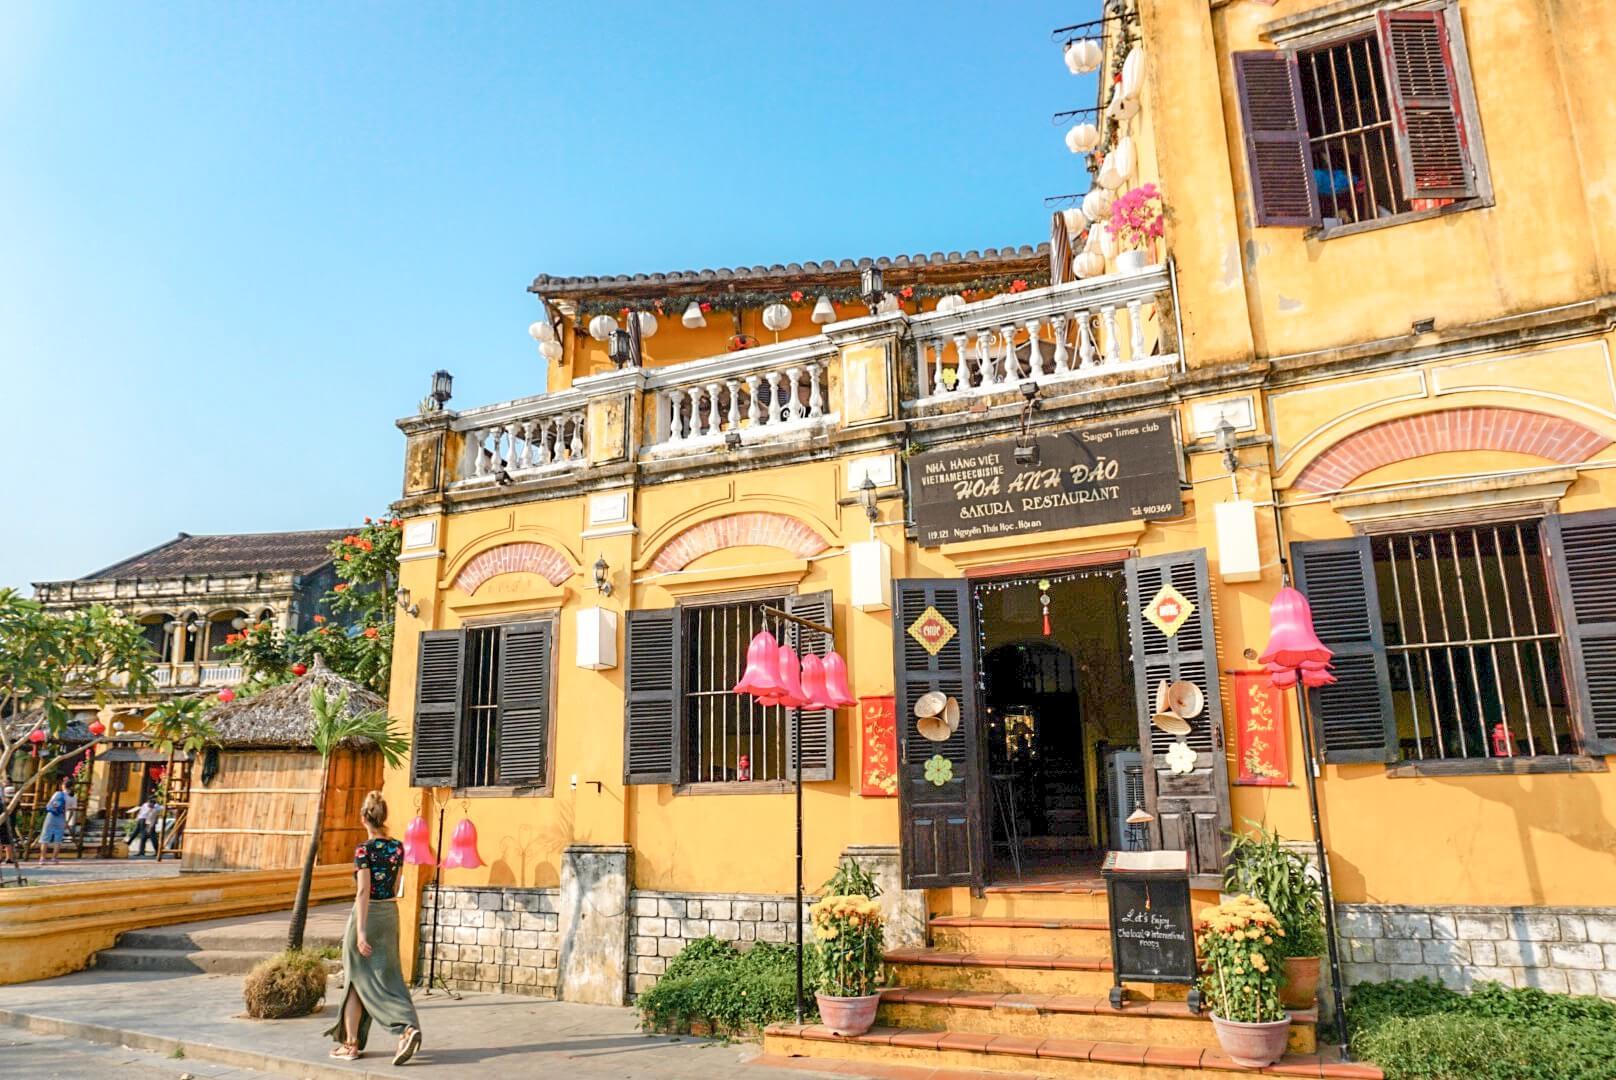 Visiter Hoi An et sa vieille ville jaune vietnam